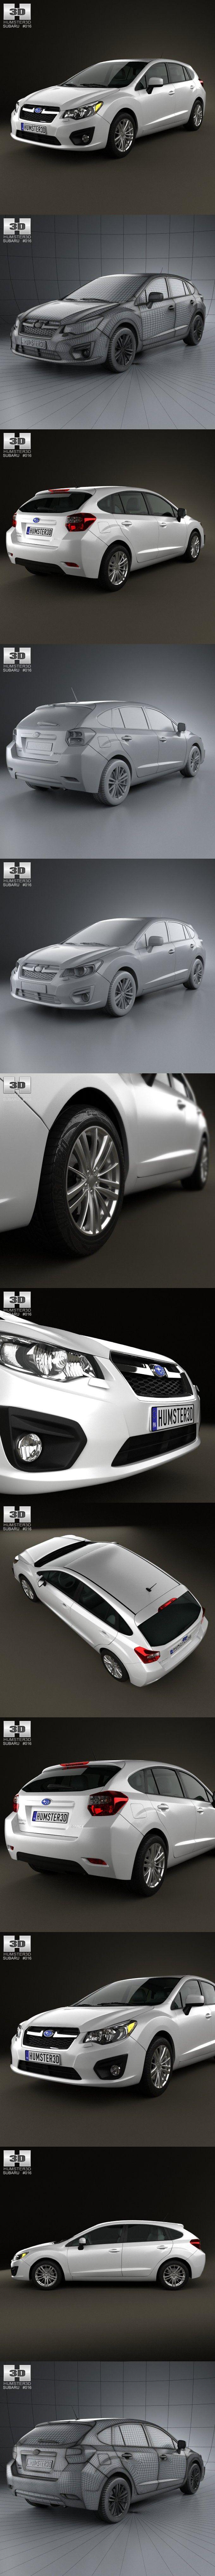 Subaru Impreza hatchback 2012. 3D Vehicles